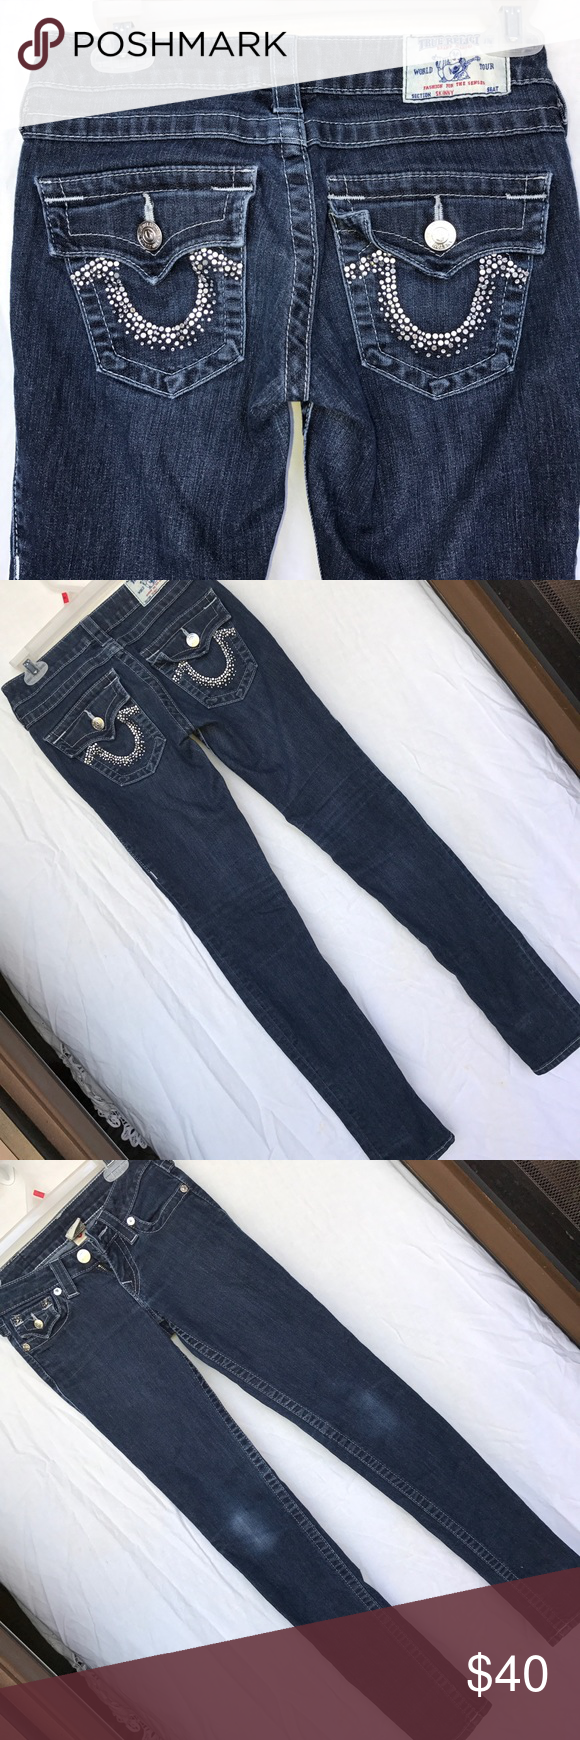 True Religion Denim Skinny Jeans 88% cotton, 10% polyester, 2% spandex True Religion Jeans Skinny